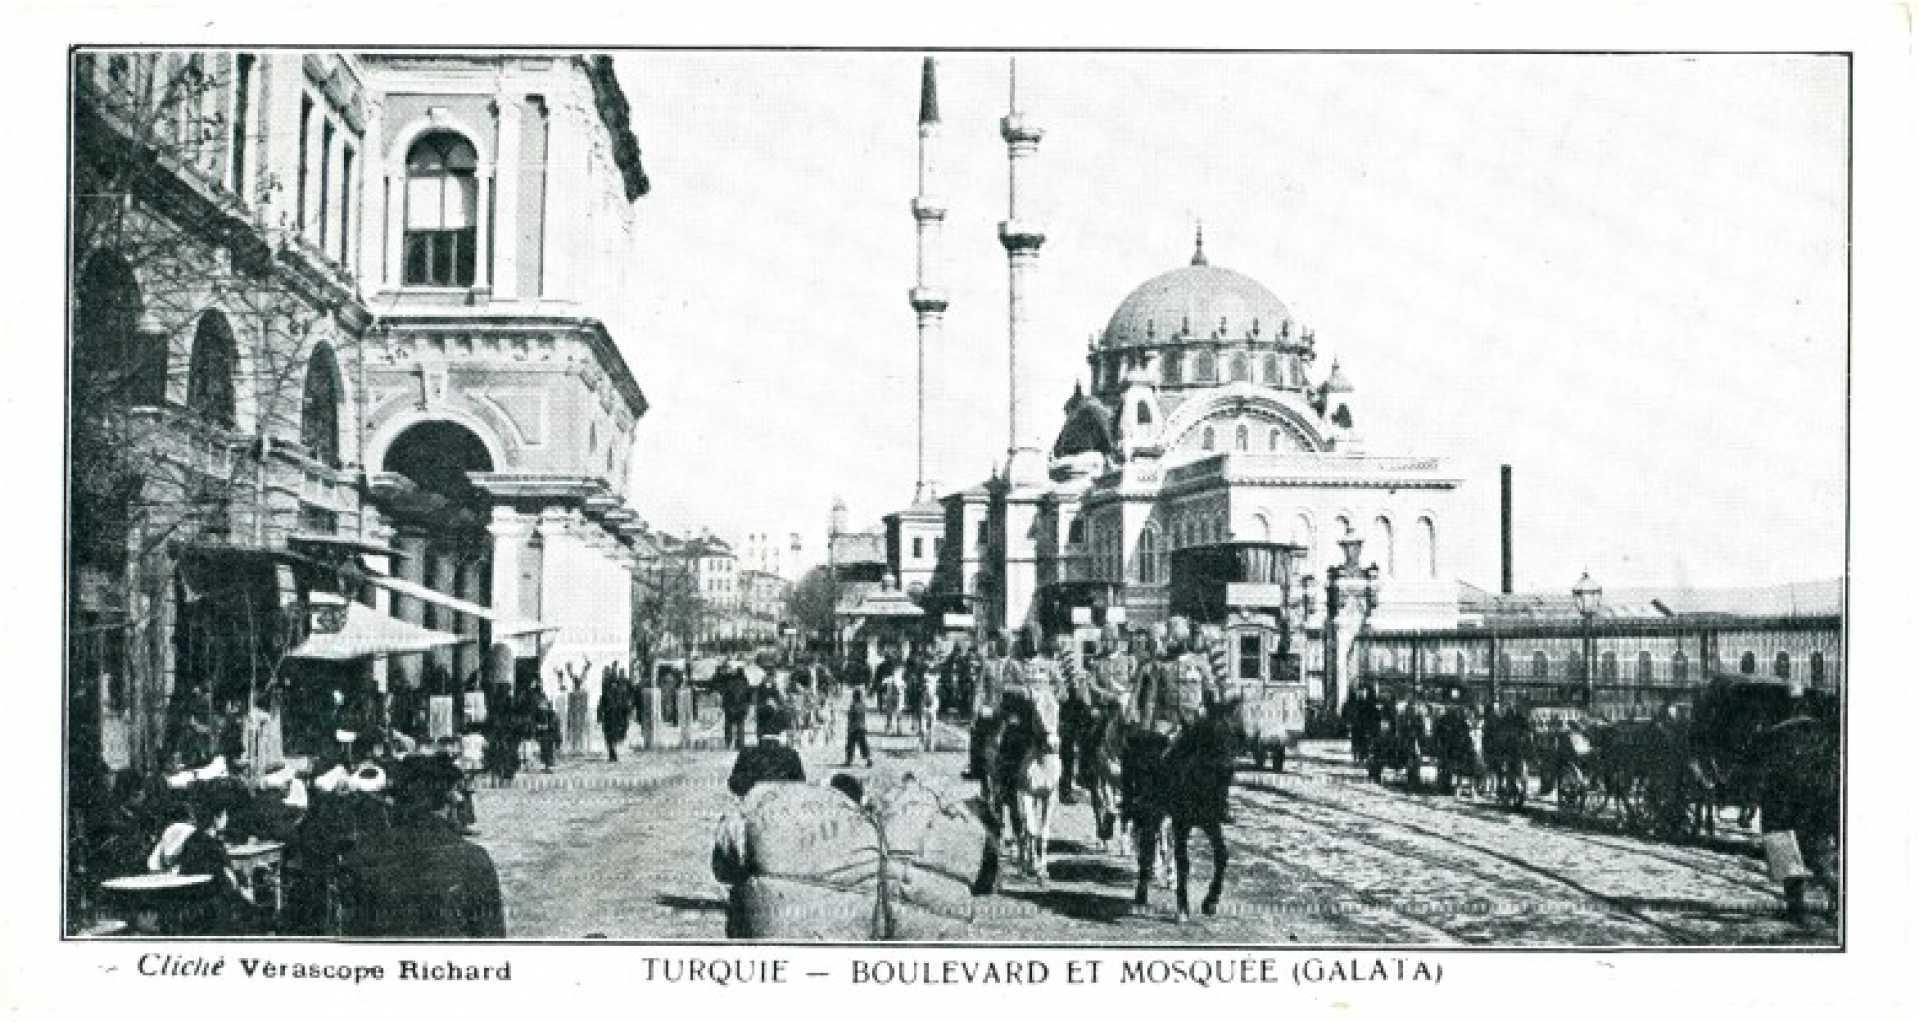 Turquie – Boulevard et Mosquee (Galata)